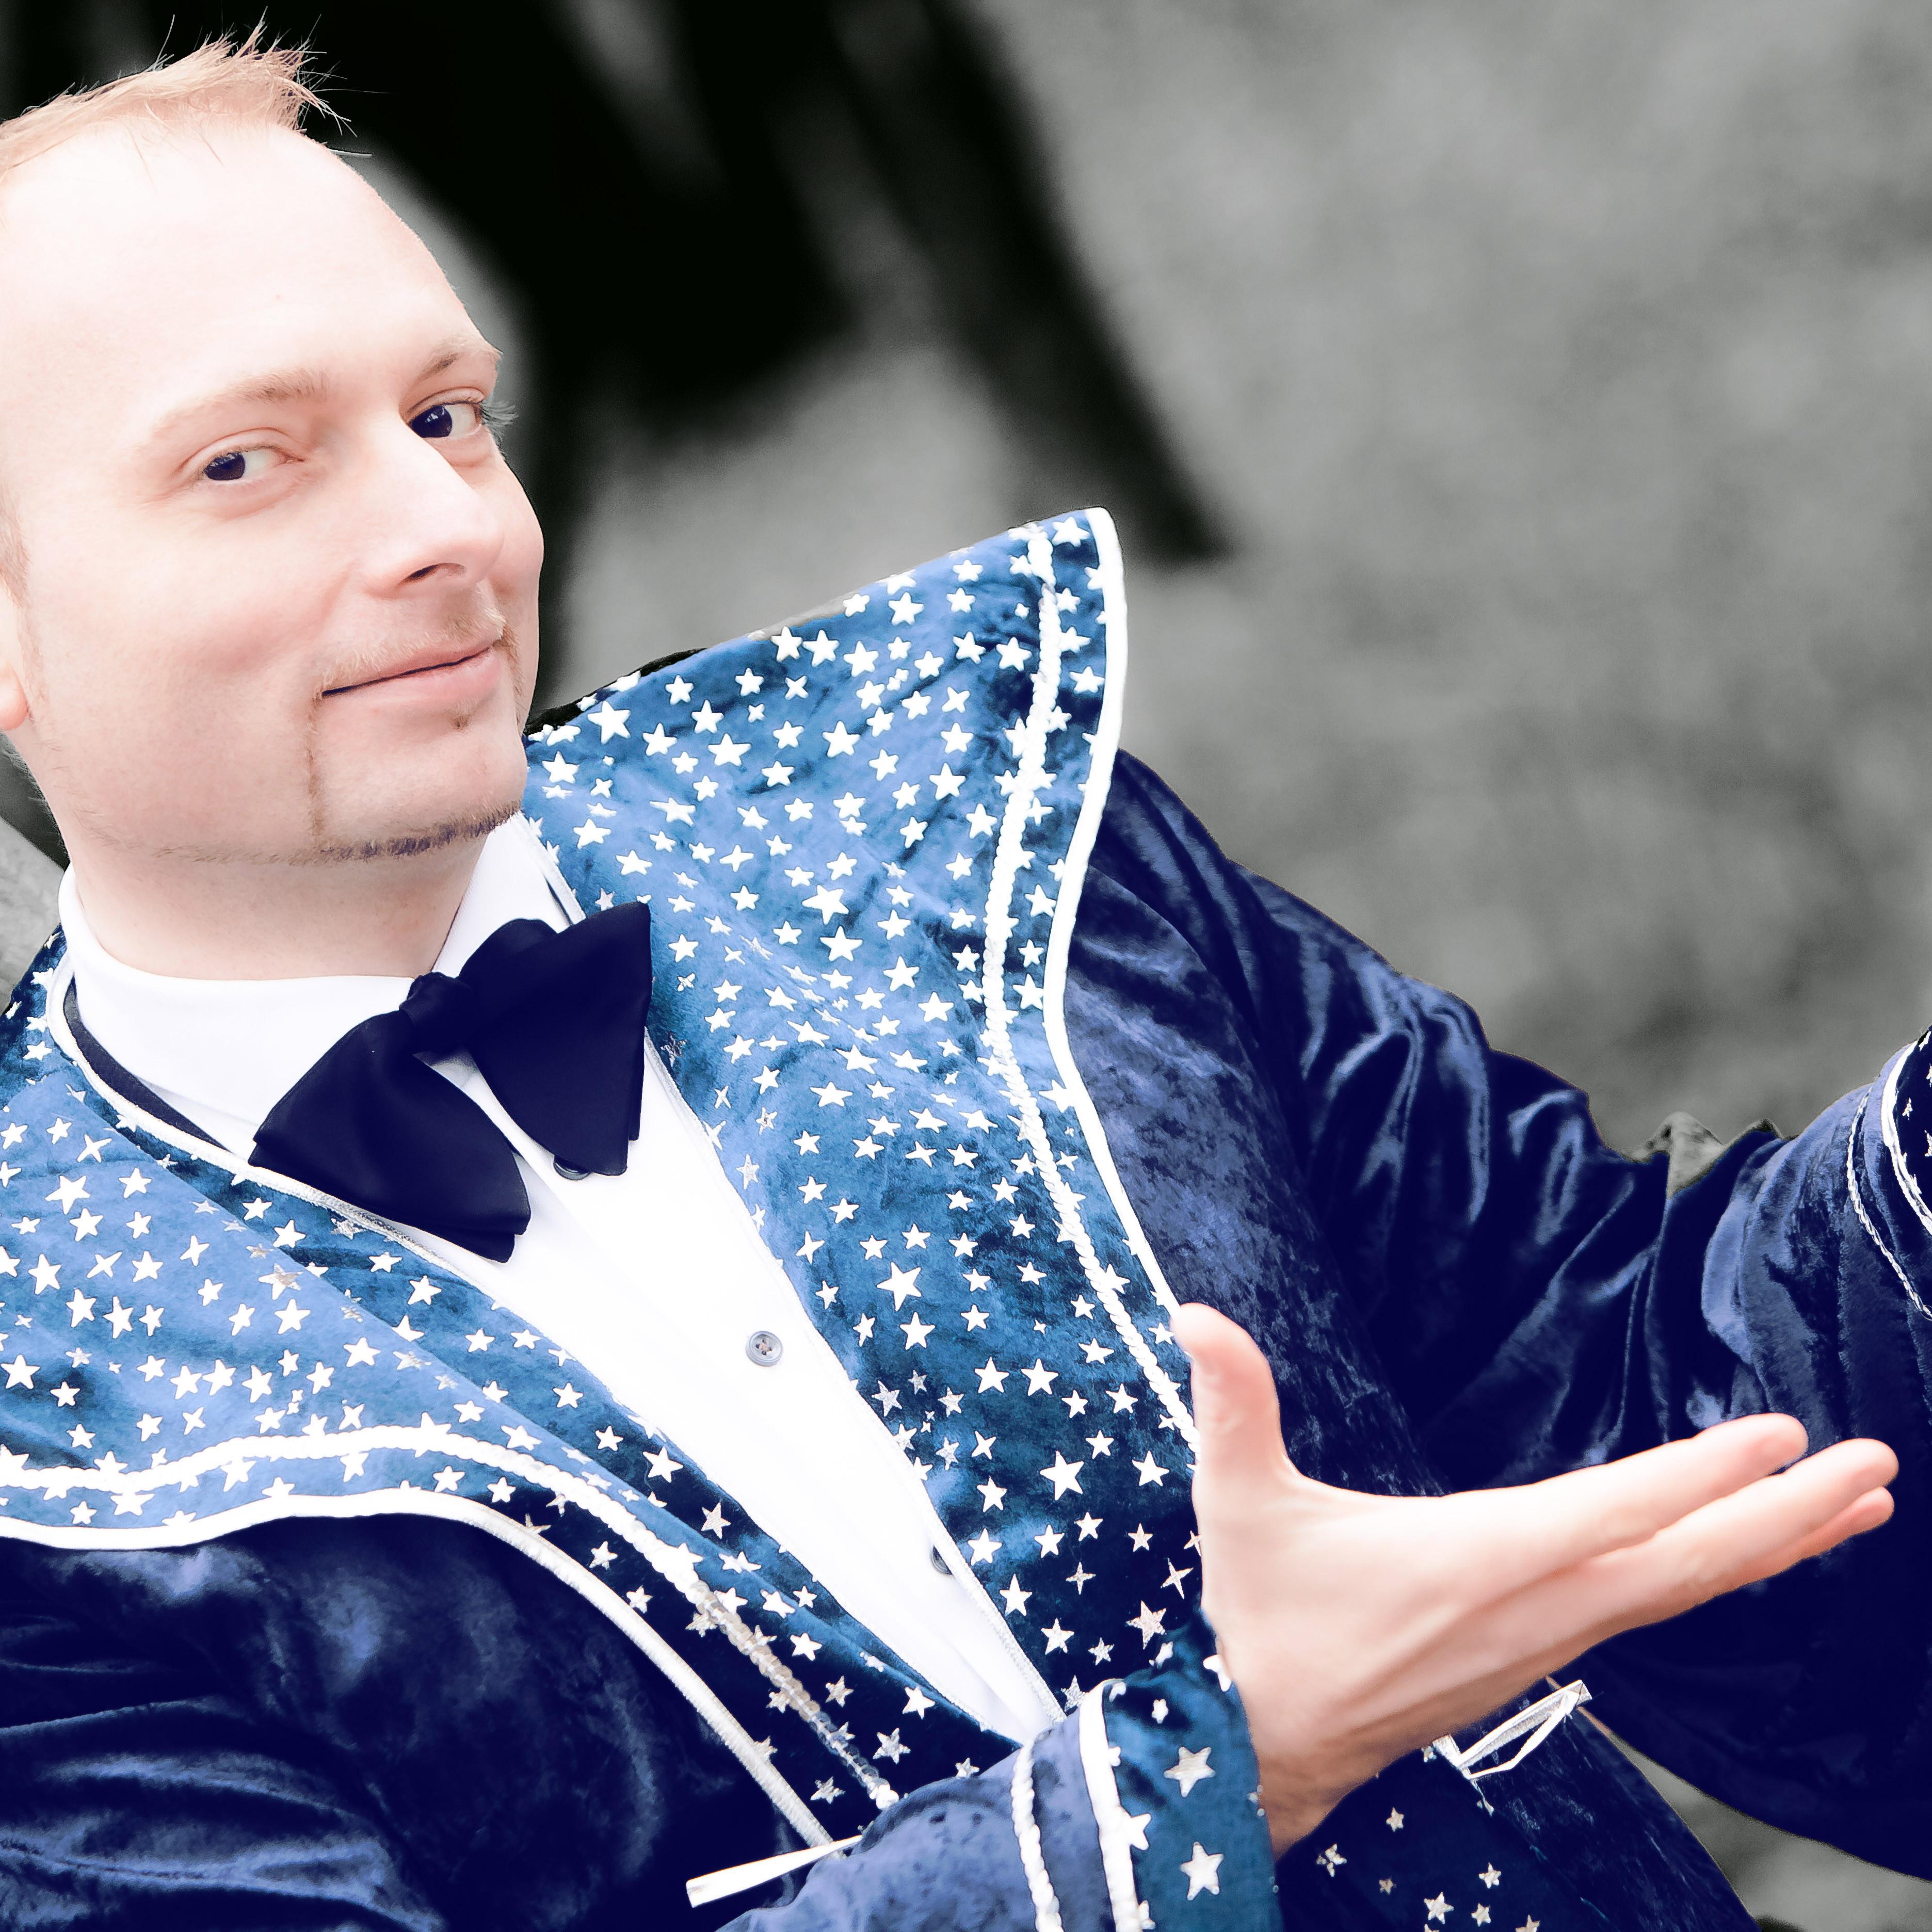 Zaubershow für Kinder